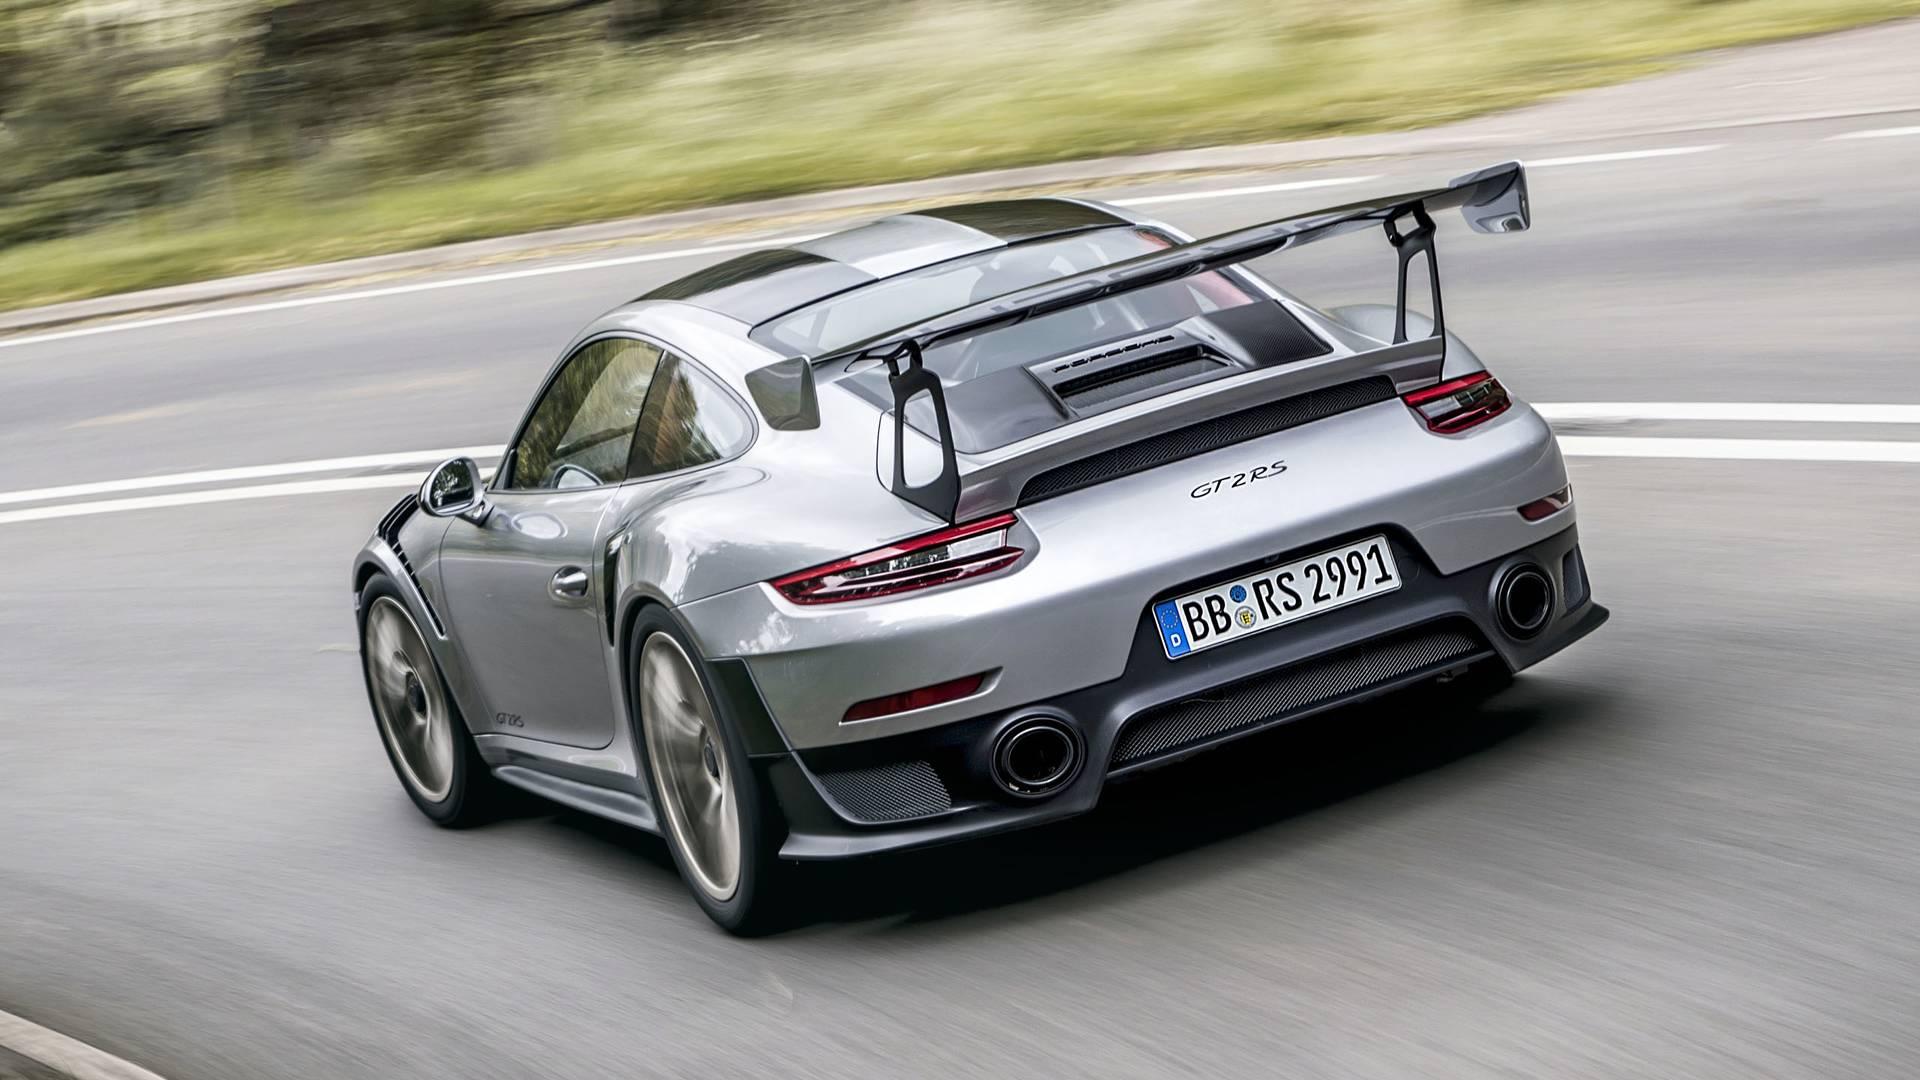 2018-porsche-911-gt2-rs-first-drive Interesting Porsche 911 Gt2 Rs Nurburgring Lap Cars Trend